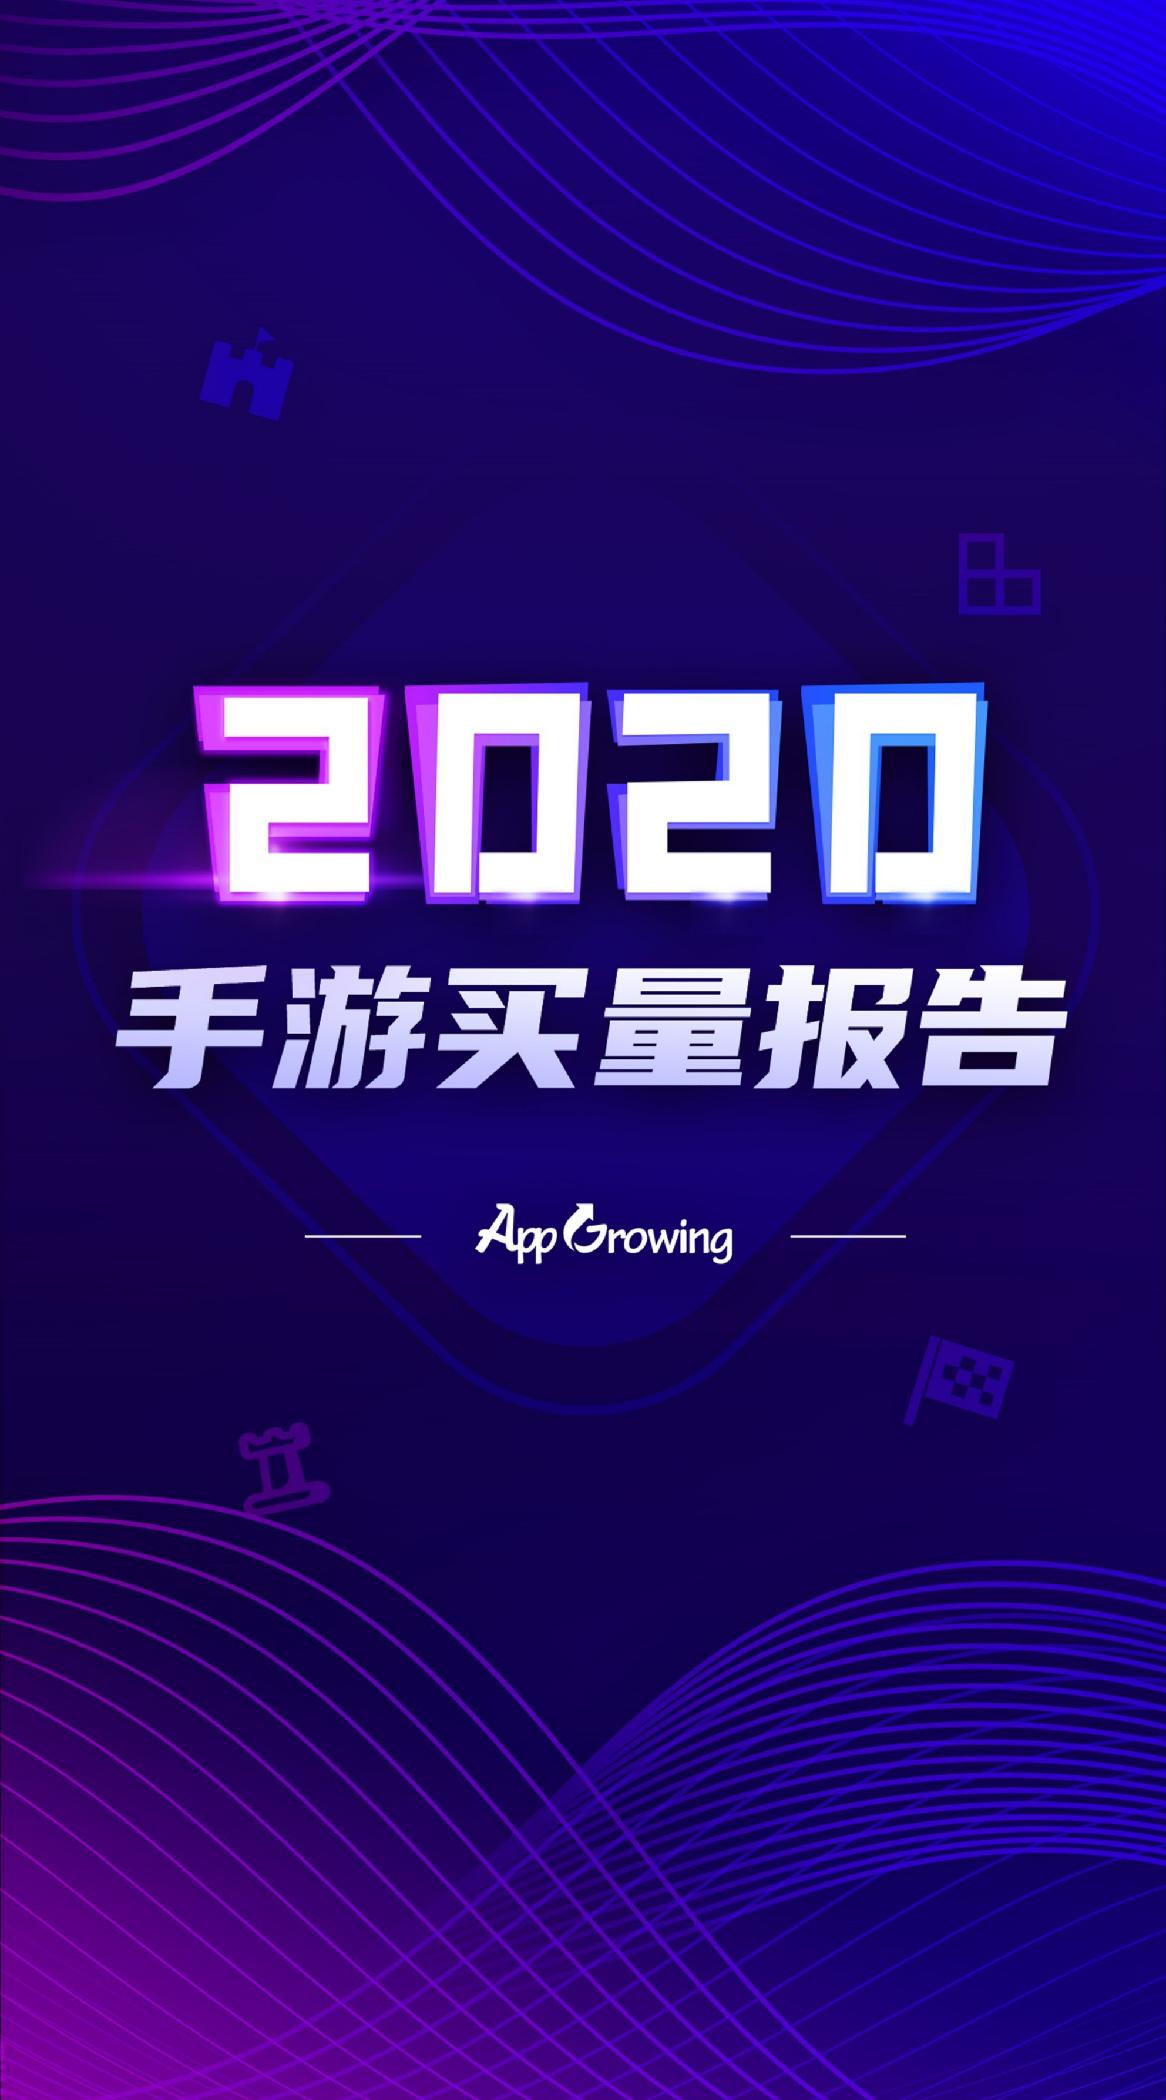 App Growing出品 - 2020年度手游买量报告